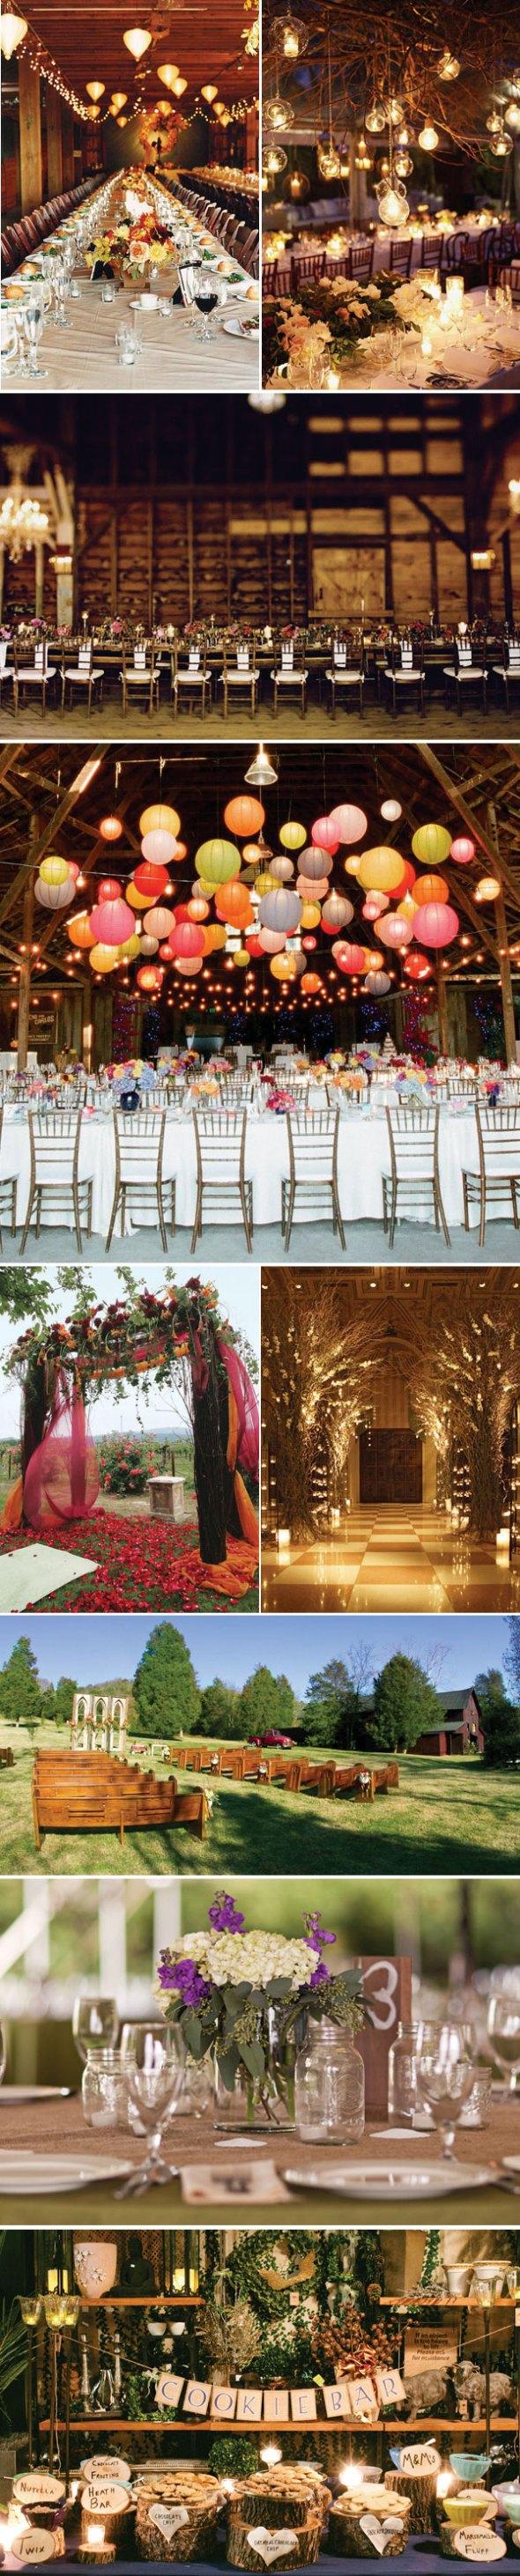 Boda campestre- Tendencias boda USA